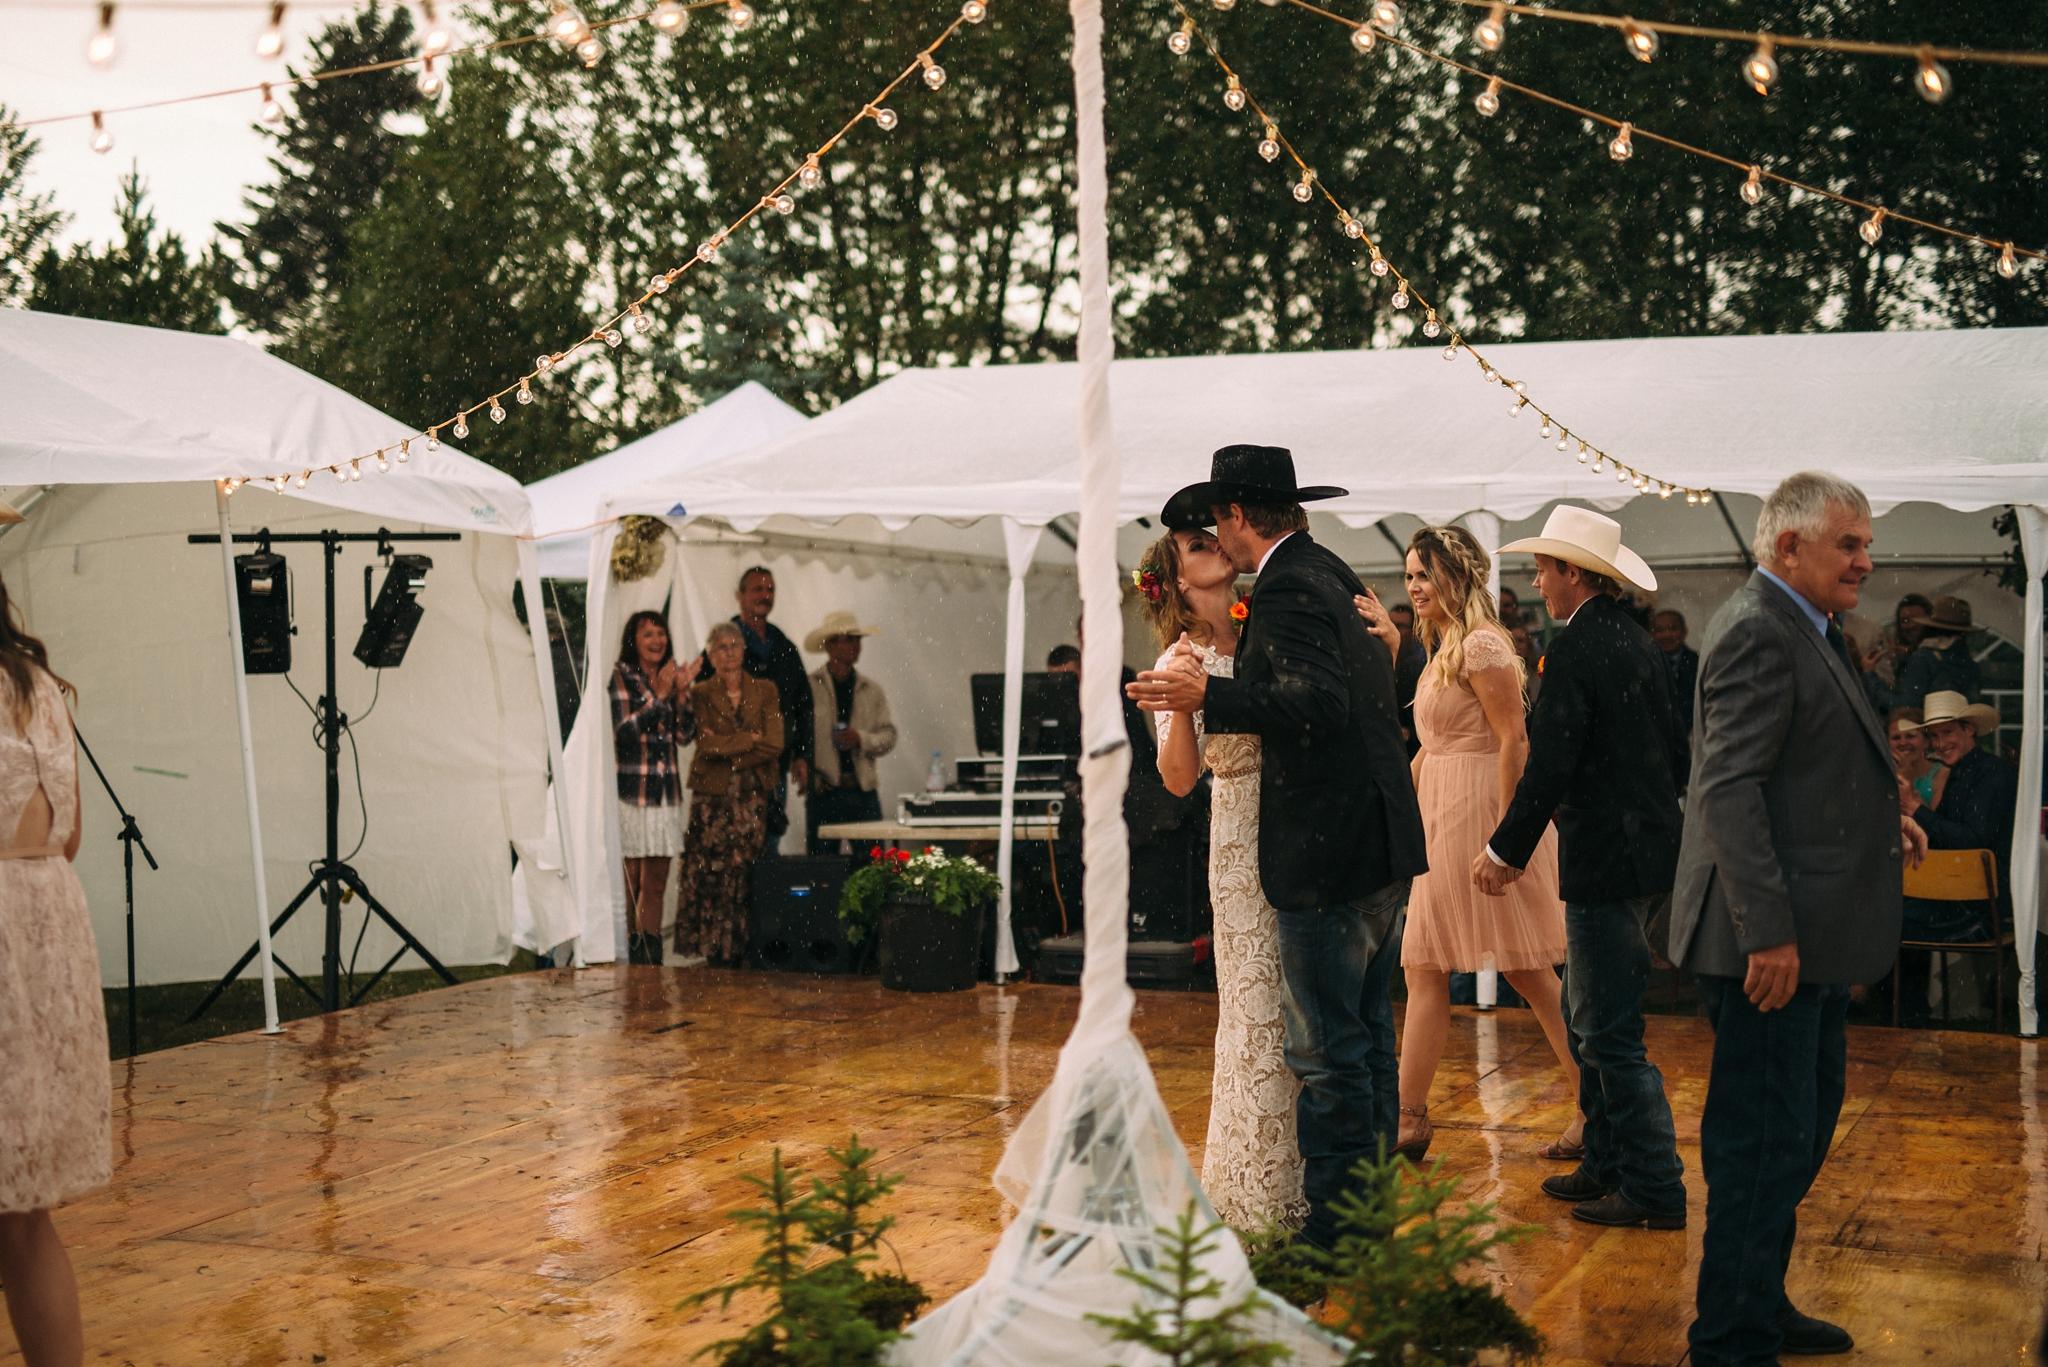 kaihla_tonai_intimate_wedding_elopement_photographer_4277